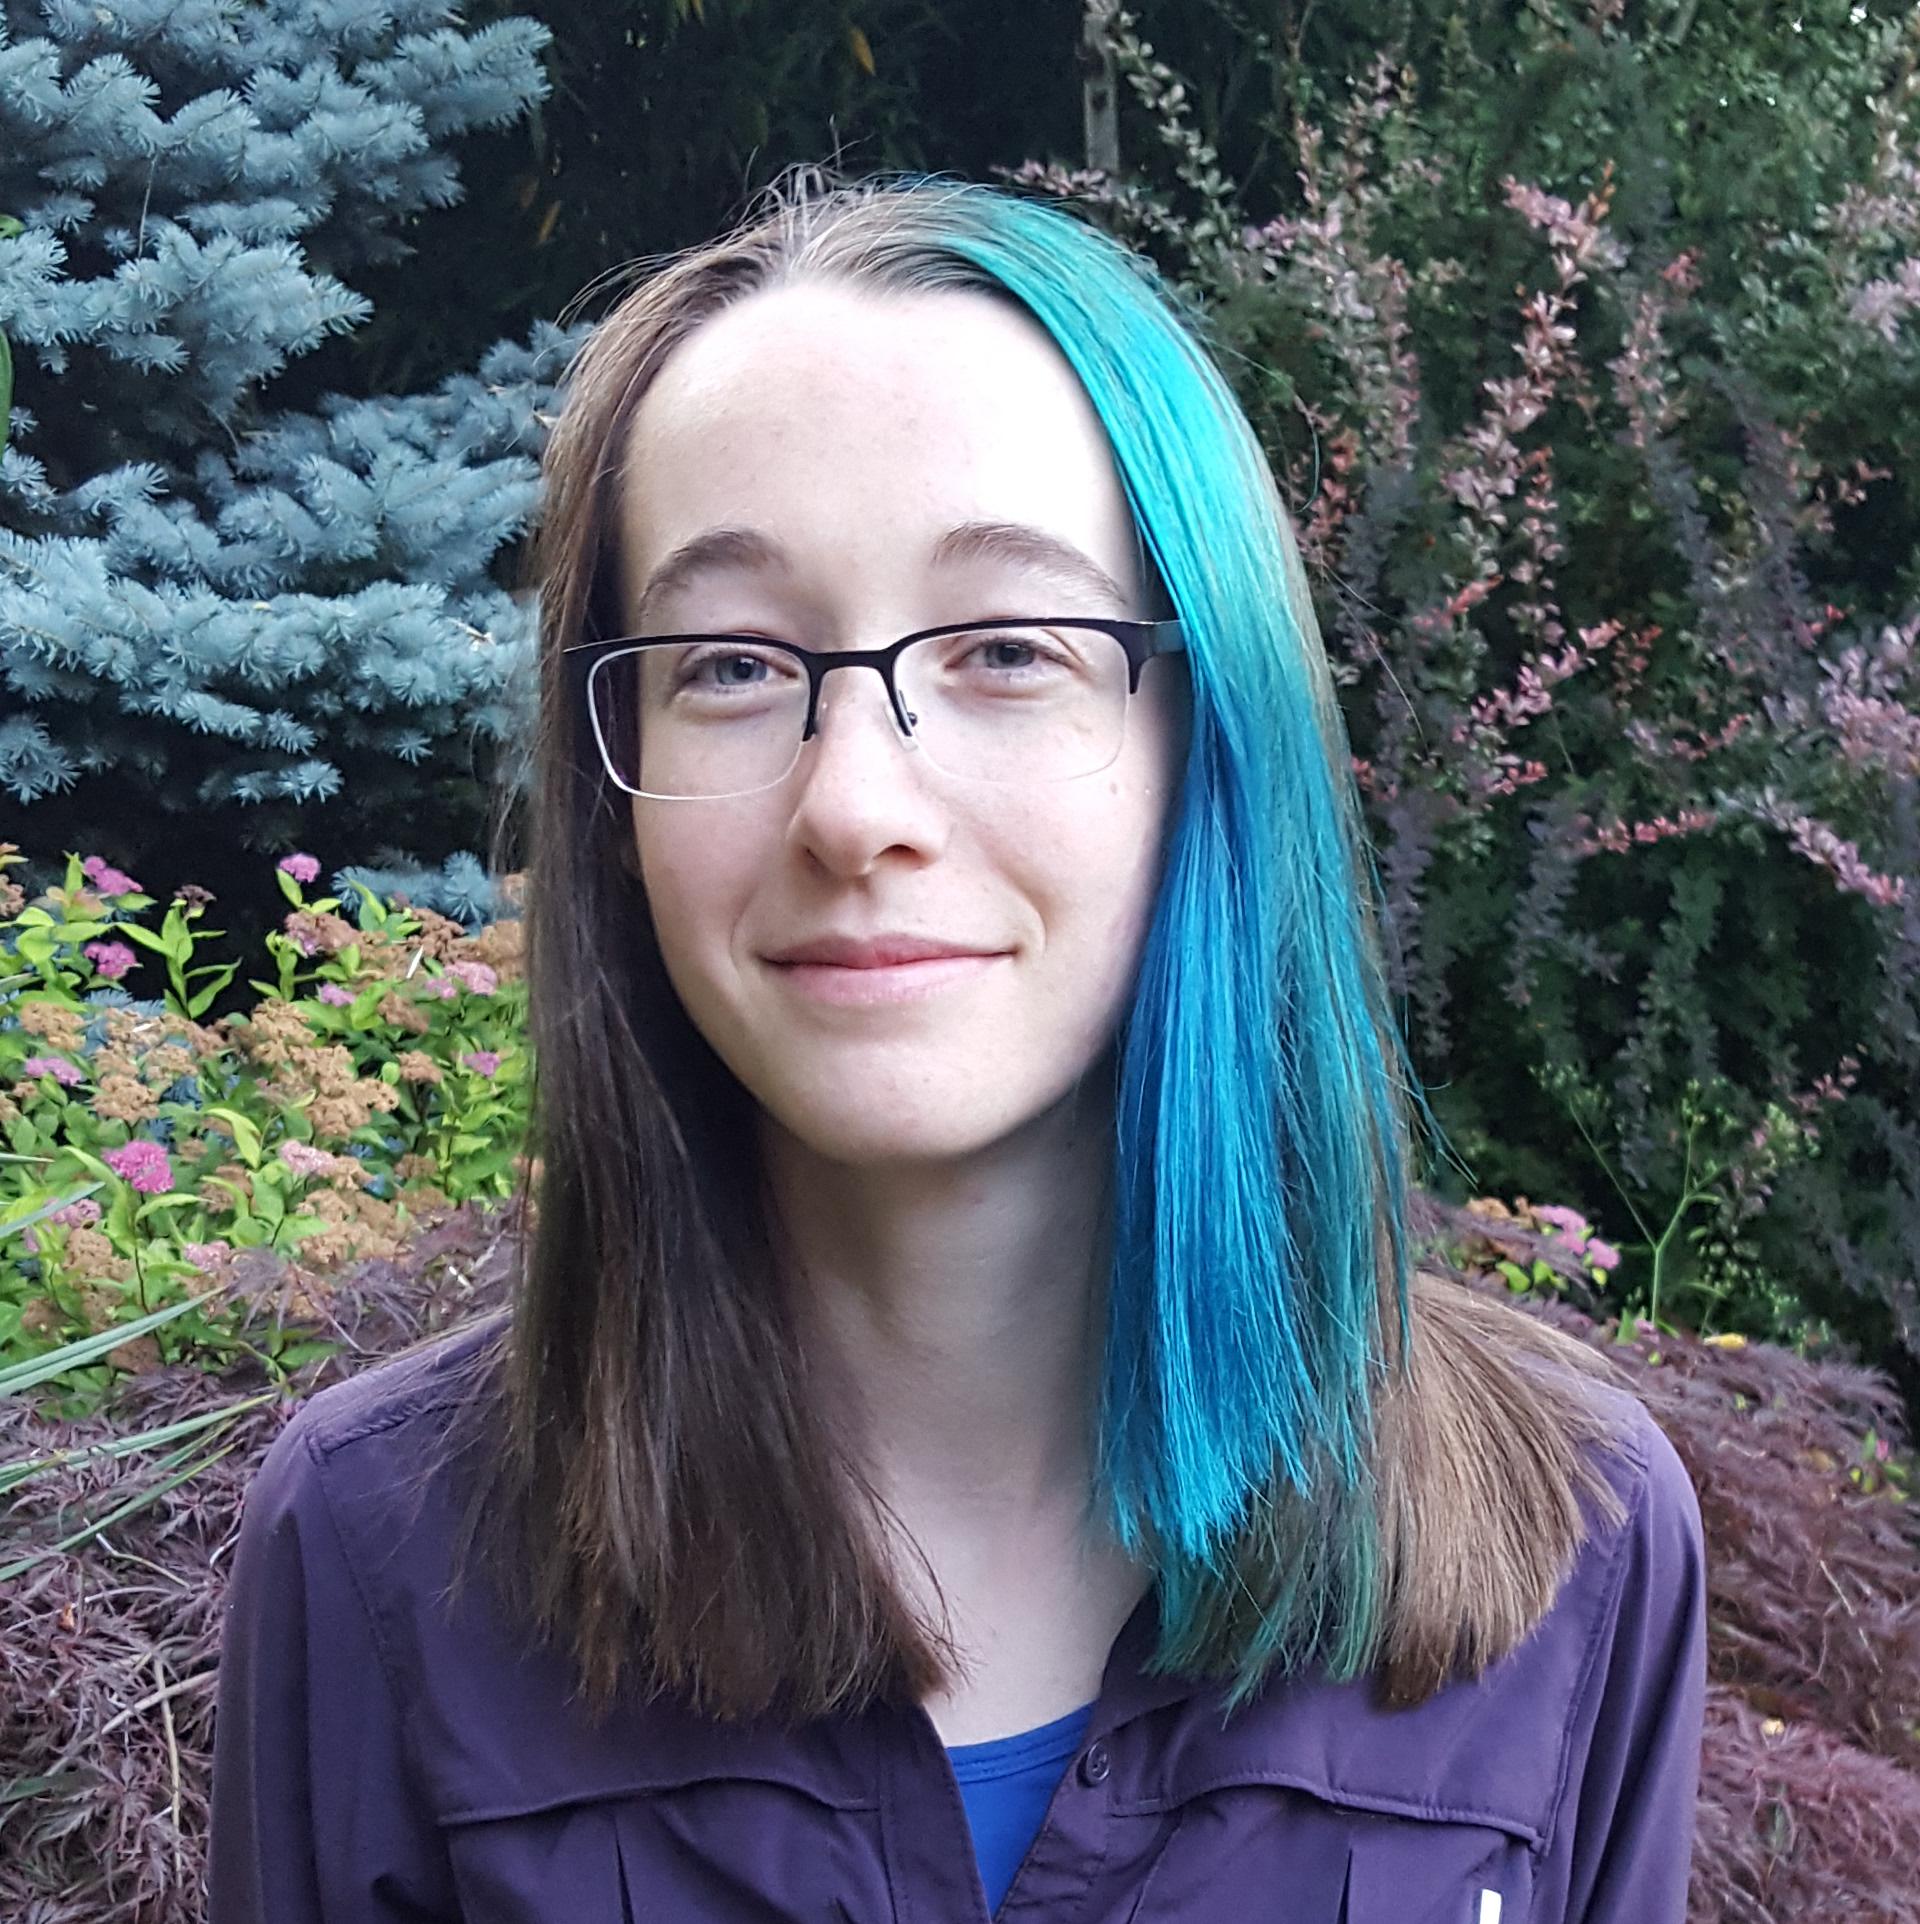 Sonya Neunzert: Developer. Freelance VR artist and programmer. Prototyping, problem-solving, and emerging-tech-wrangling.